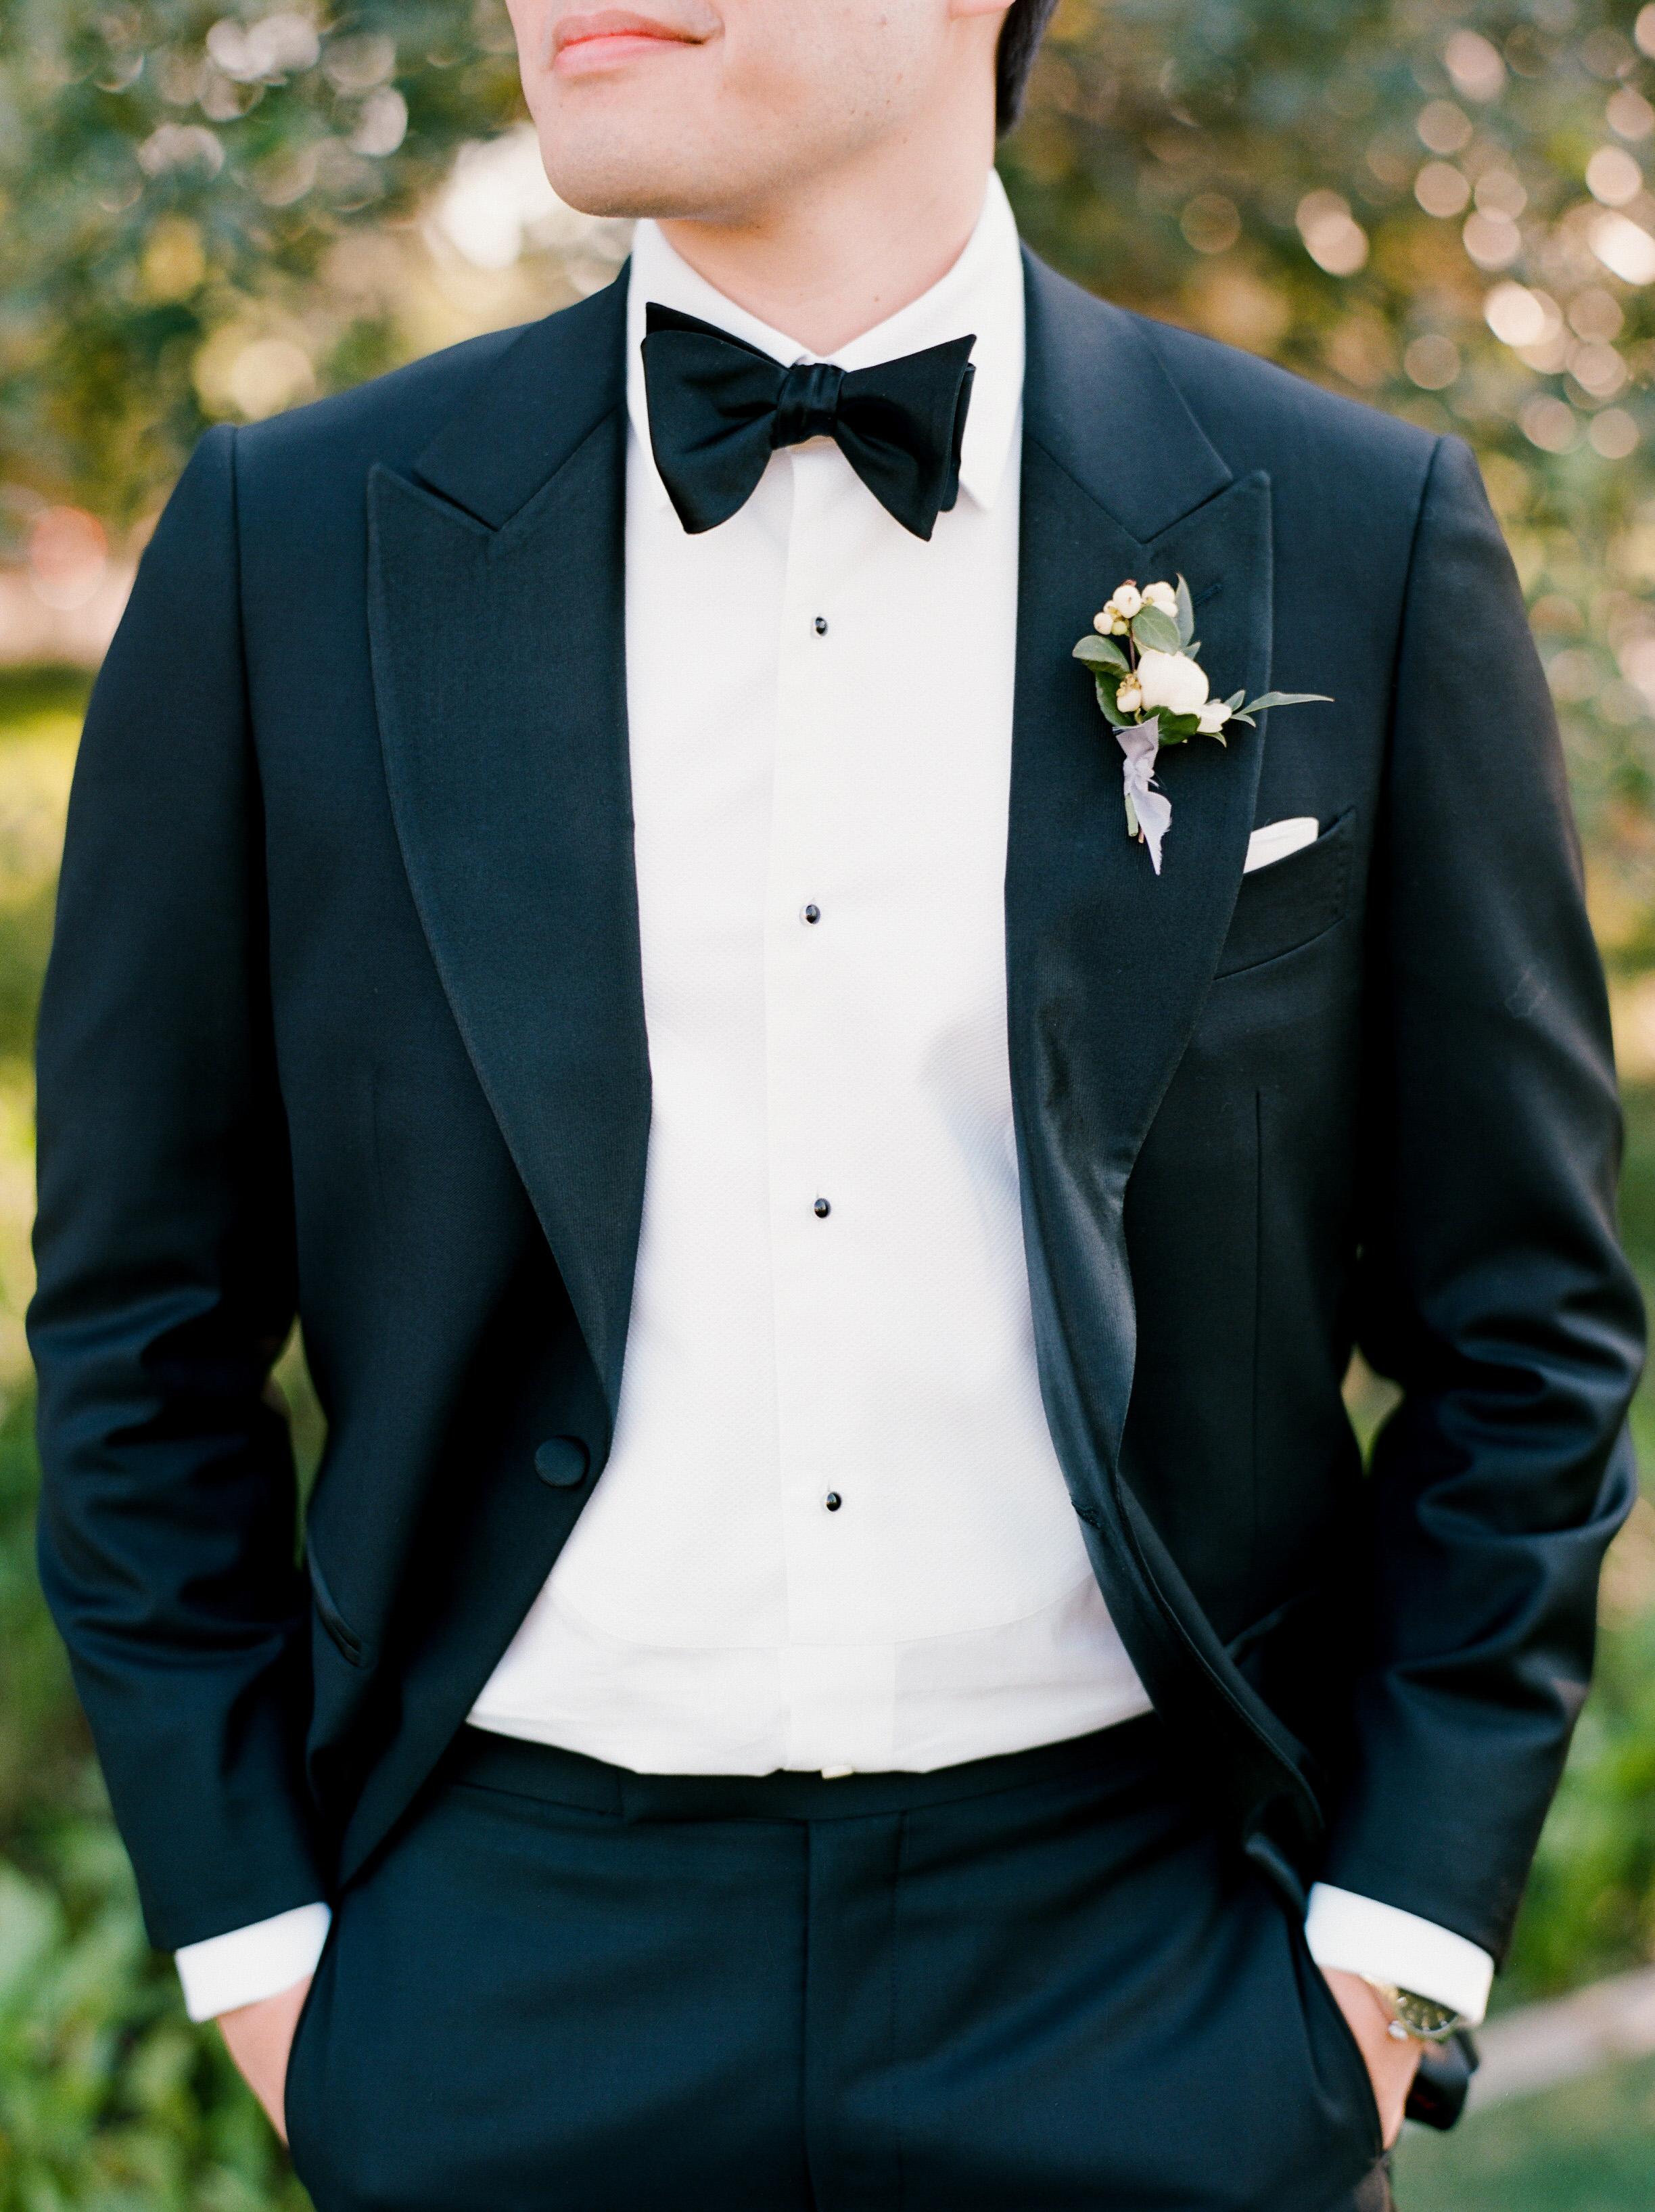 Martha-Stewart-Wedding-Dana-Fernandez-Photography-Josh-Texas-Film-Houston-Wedding-Fine-Art-Photographer-McGovern-Centennial-Gardens-Top-Best-167.jpg